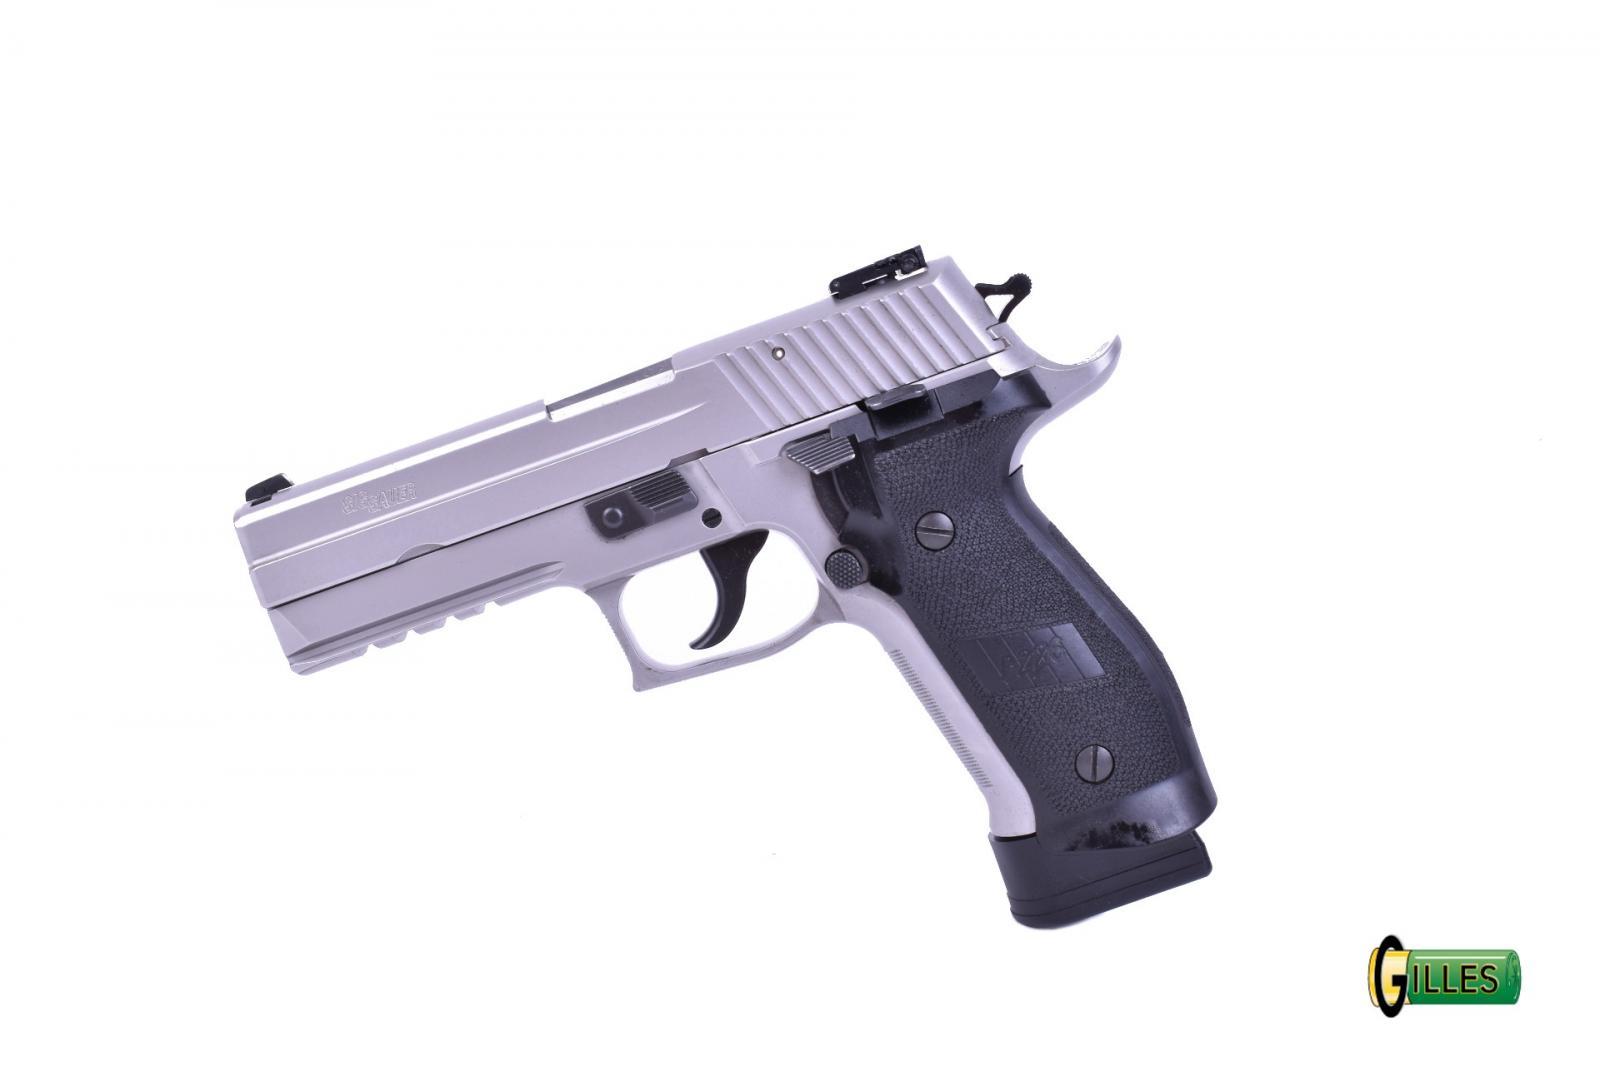 OCCASION Pistolet SIG P226 LDC Cal 9mm